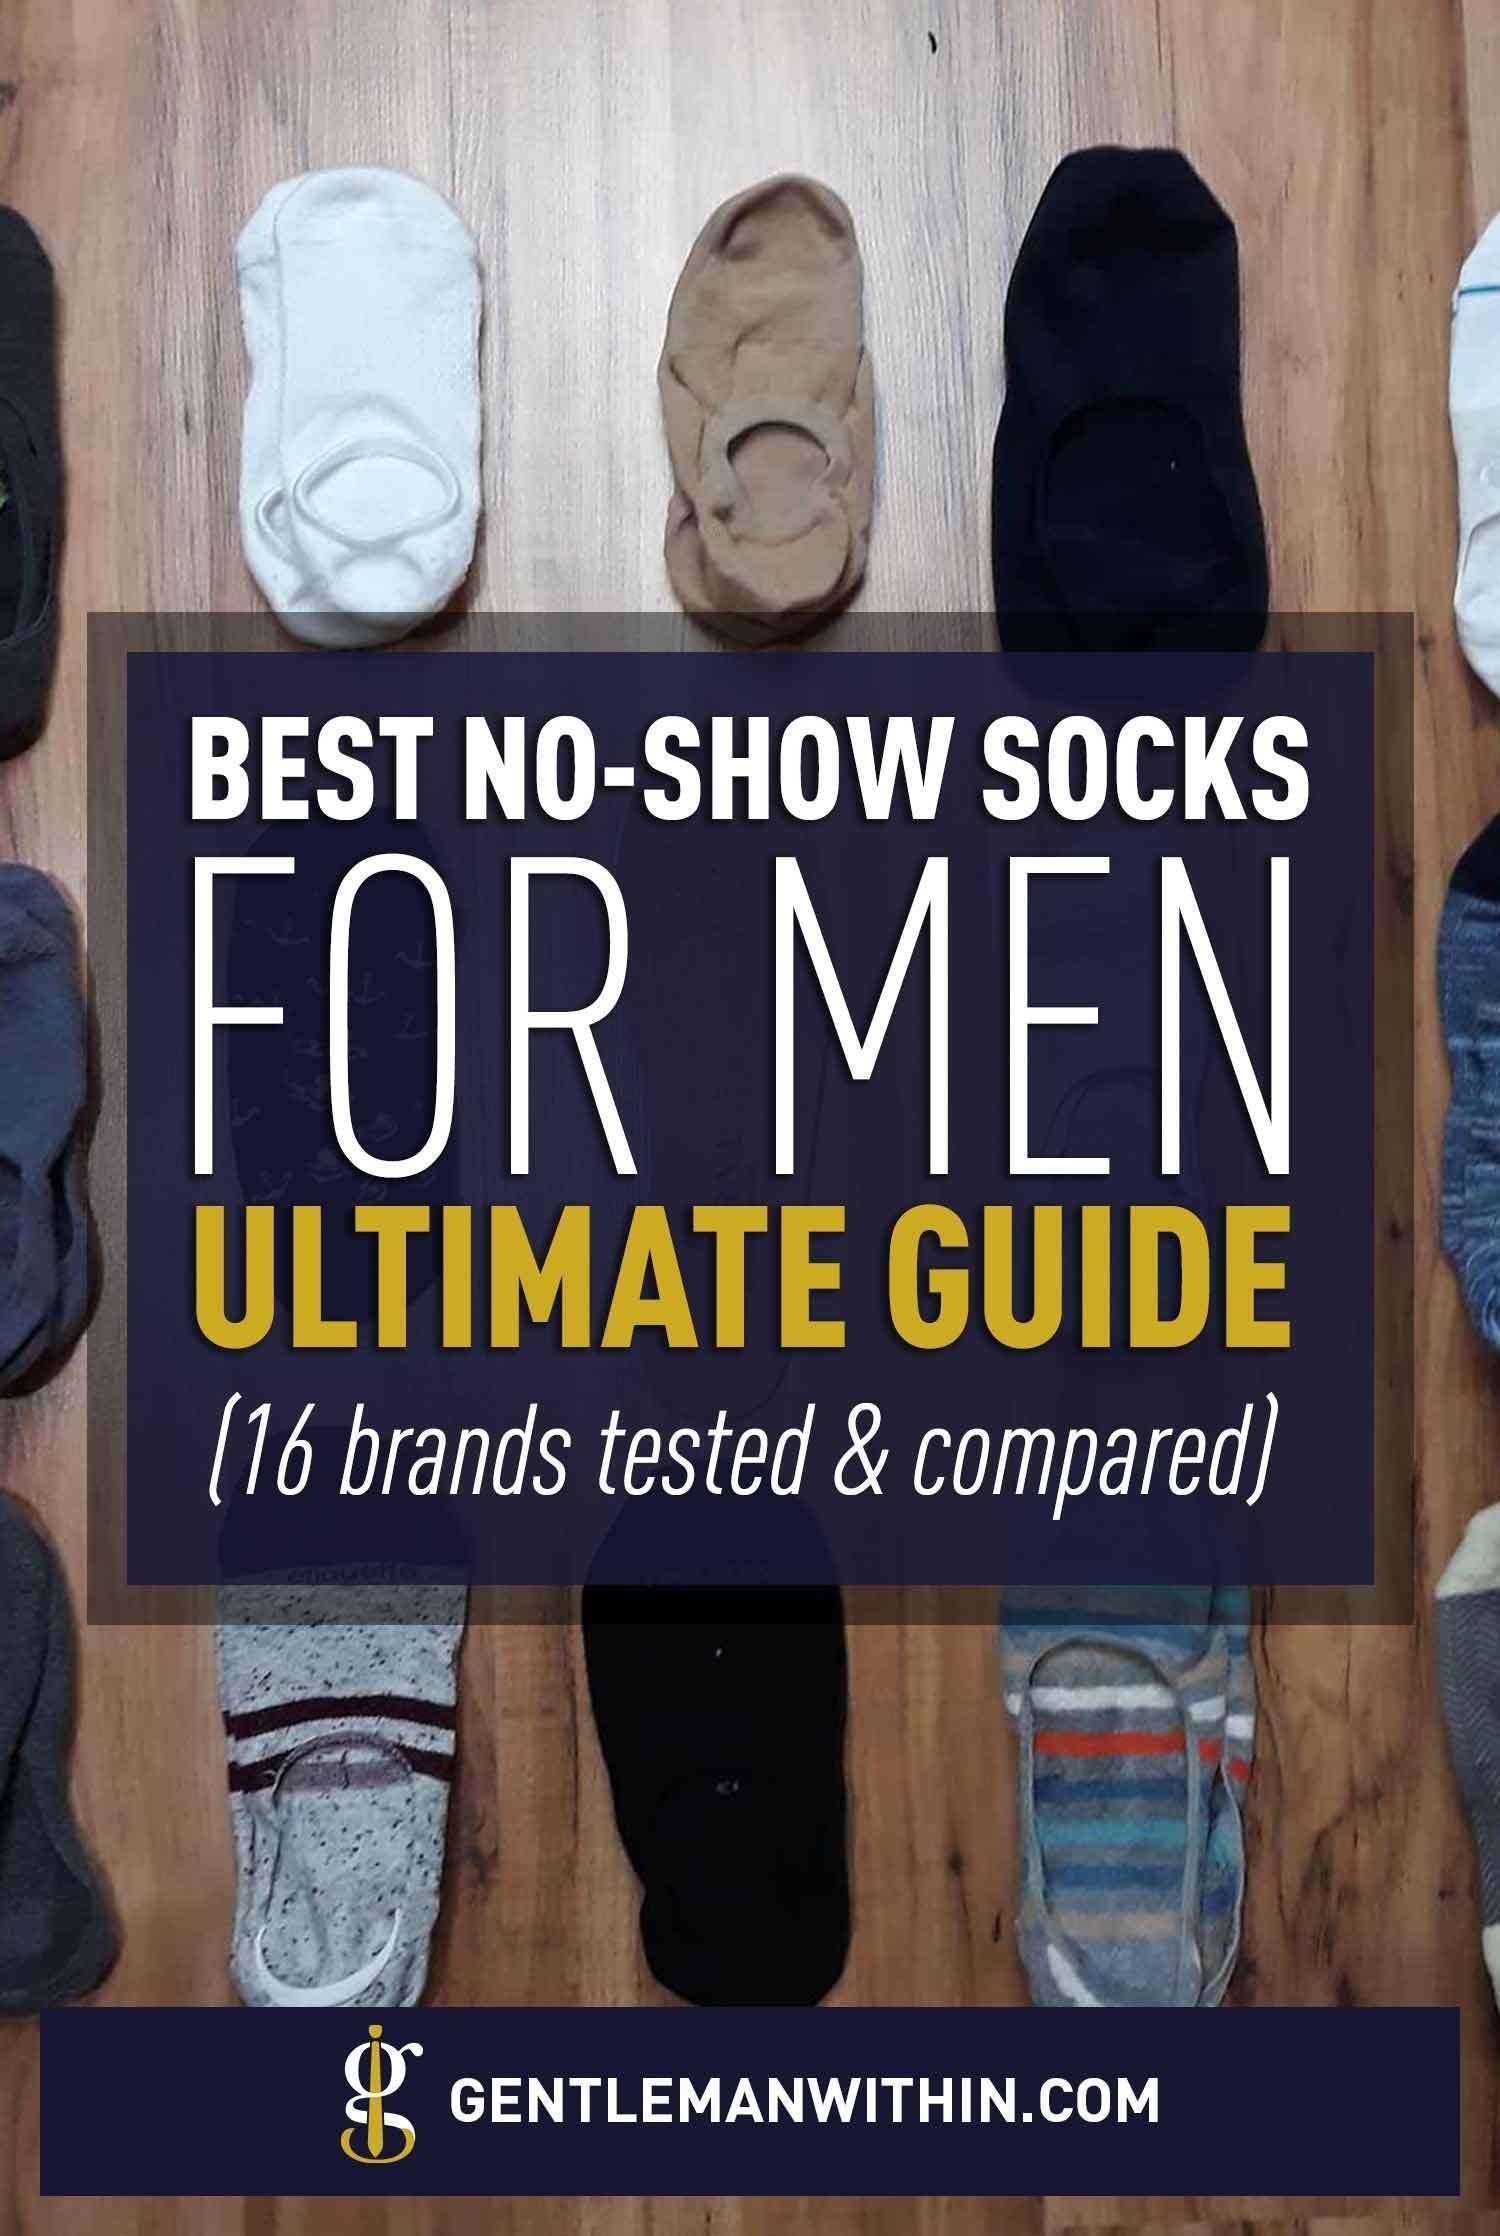 Best No Show Socks For Men: 16 Brands